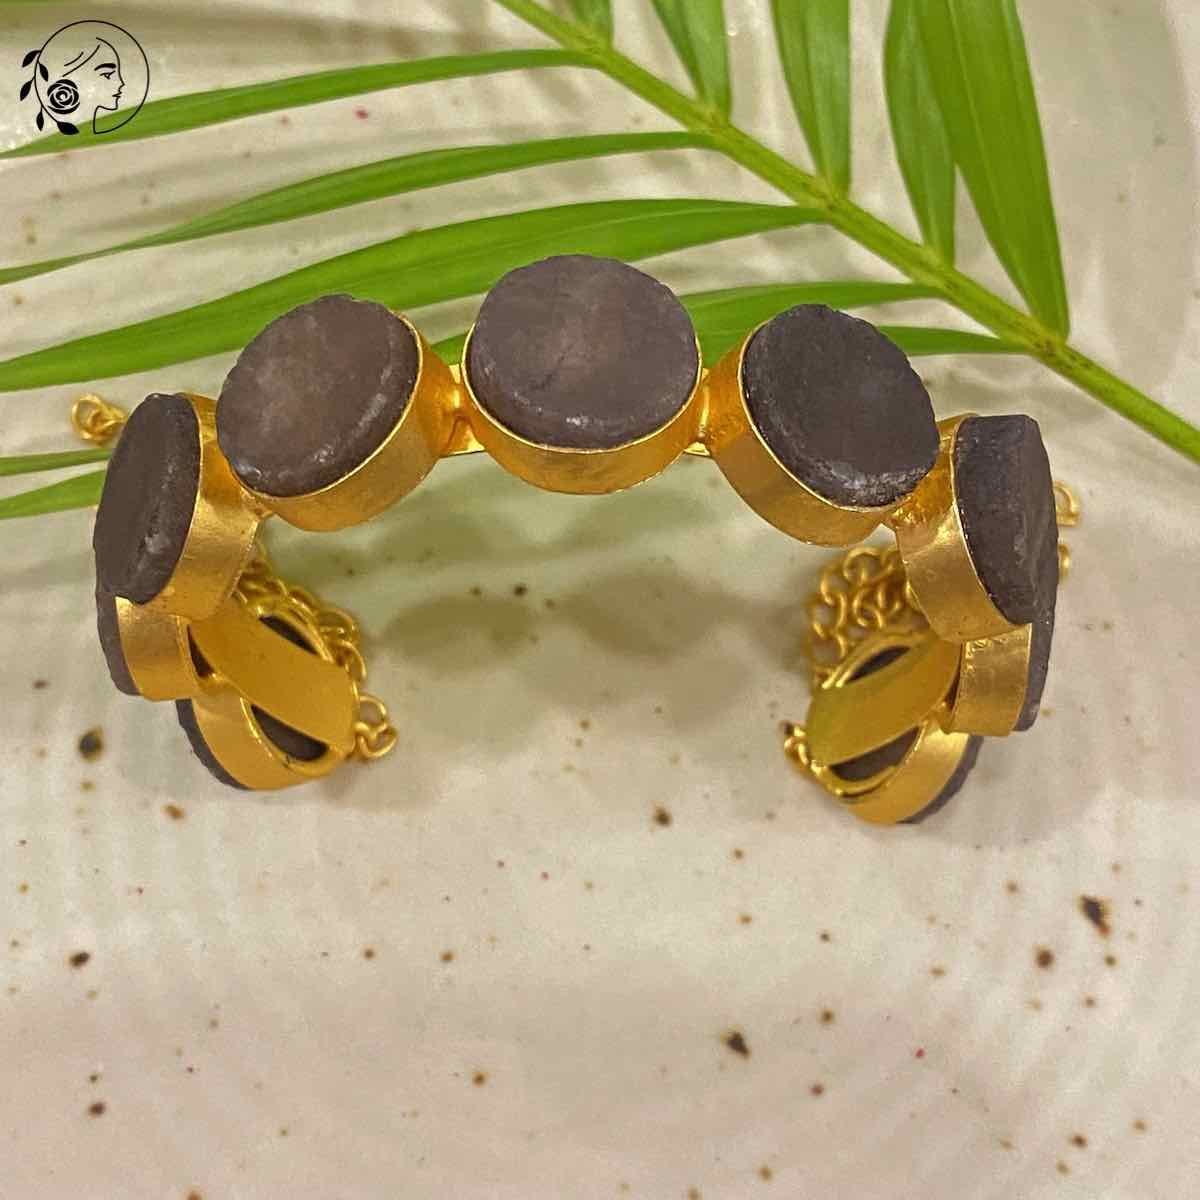 Swabhimann Jwellery | Swabhimann Pimpora Druzy Bracelet with Purple Stones Adjustable